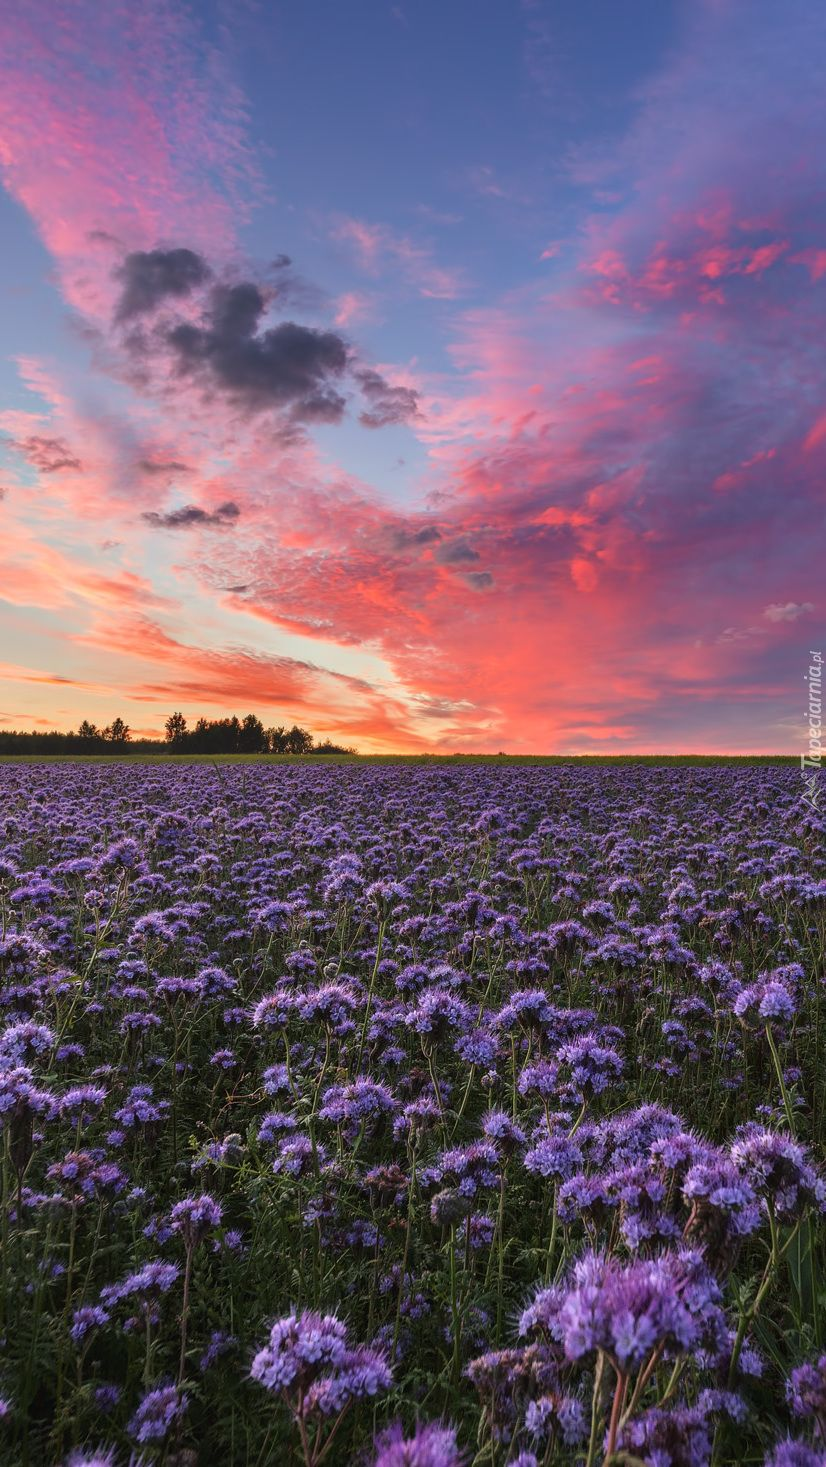 Fioletowe Kwiaty Na Lace Tapeta Na Telefon Nature Aesthetic Sky Aesthetic Nature Photography